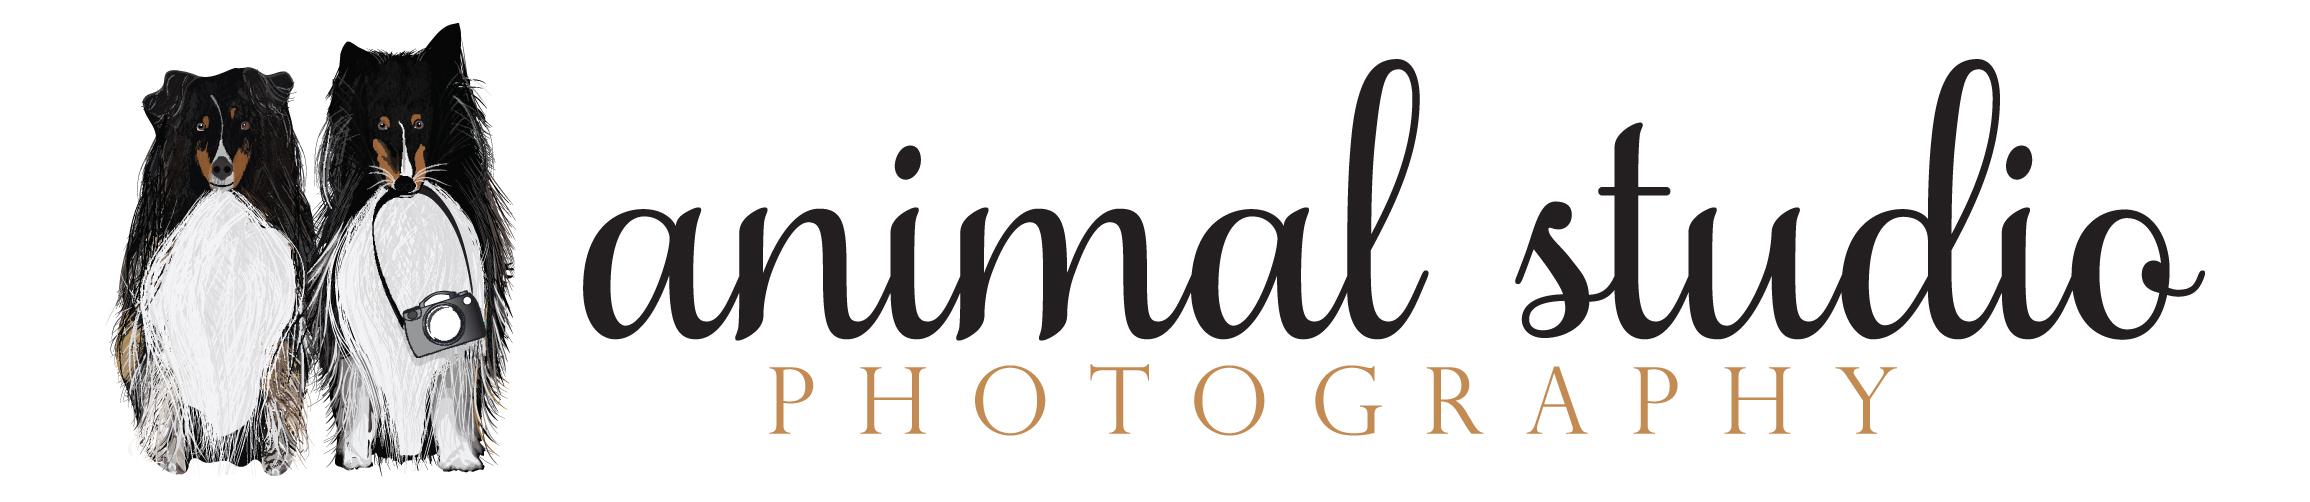 animal studio photography logo